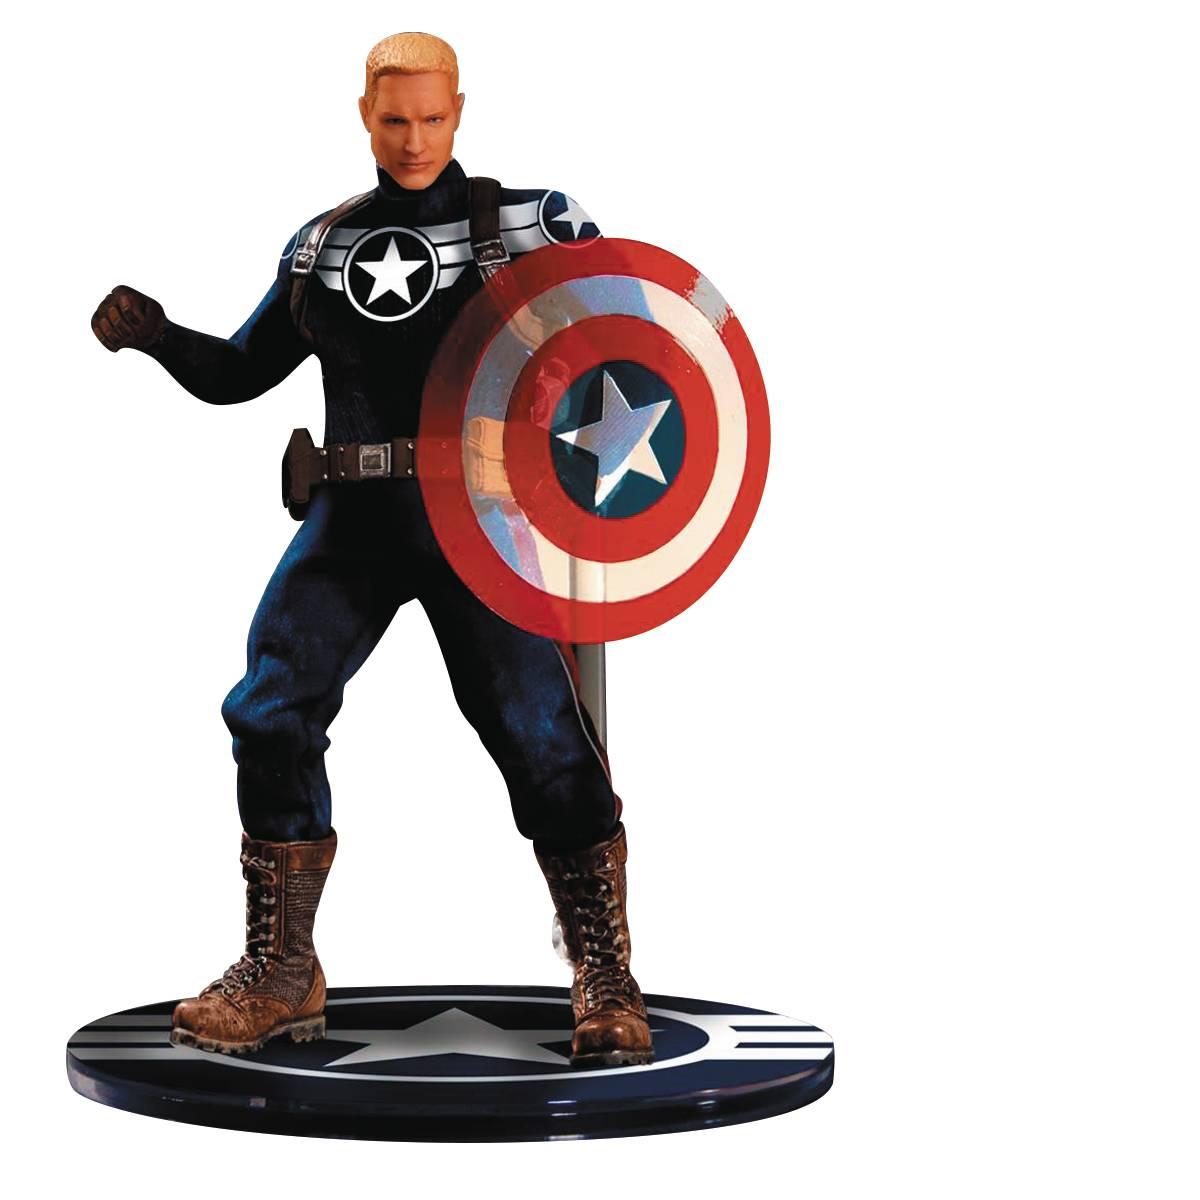 Mezco Previews Exclusive One:12 Collective Commander Rogers Captain America